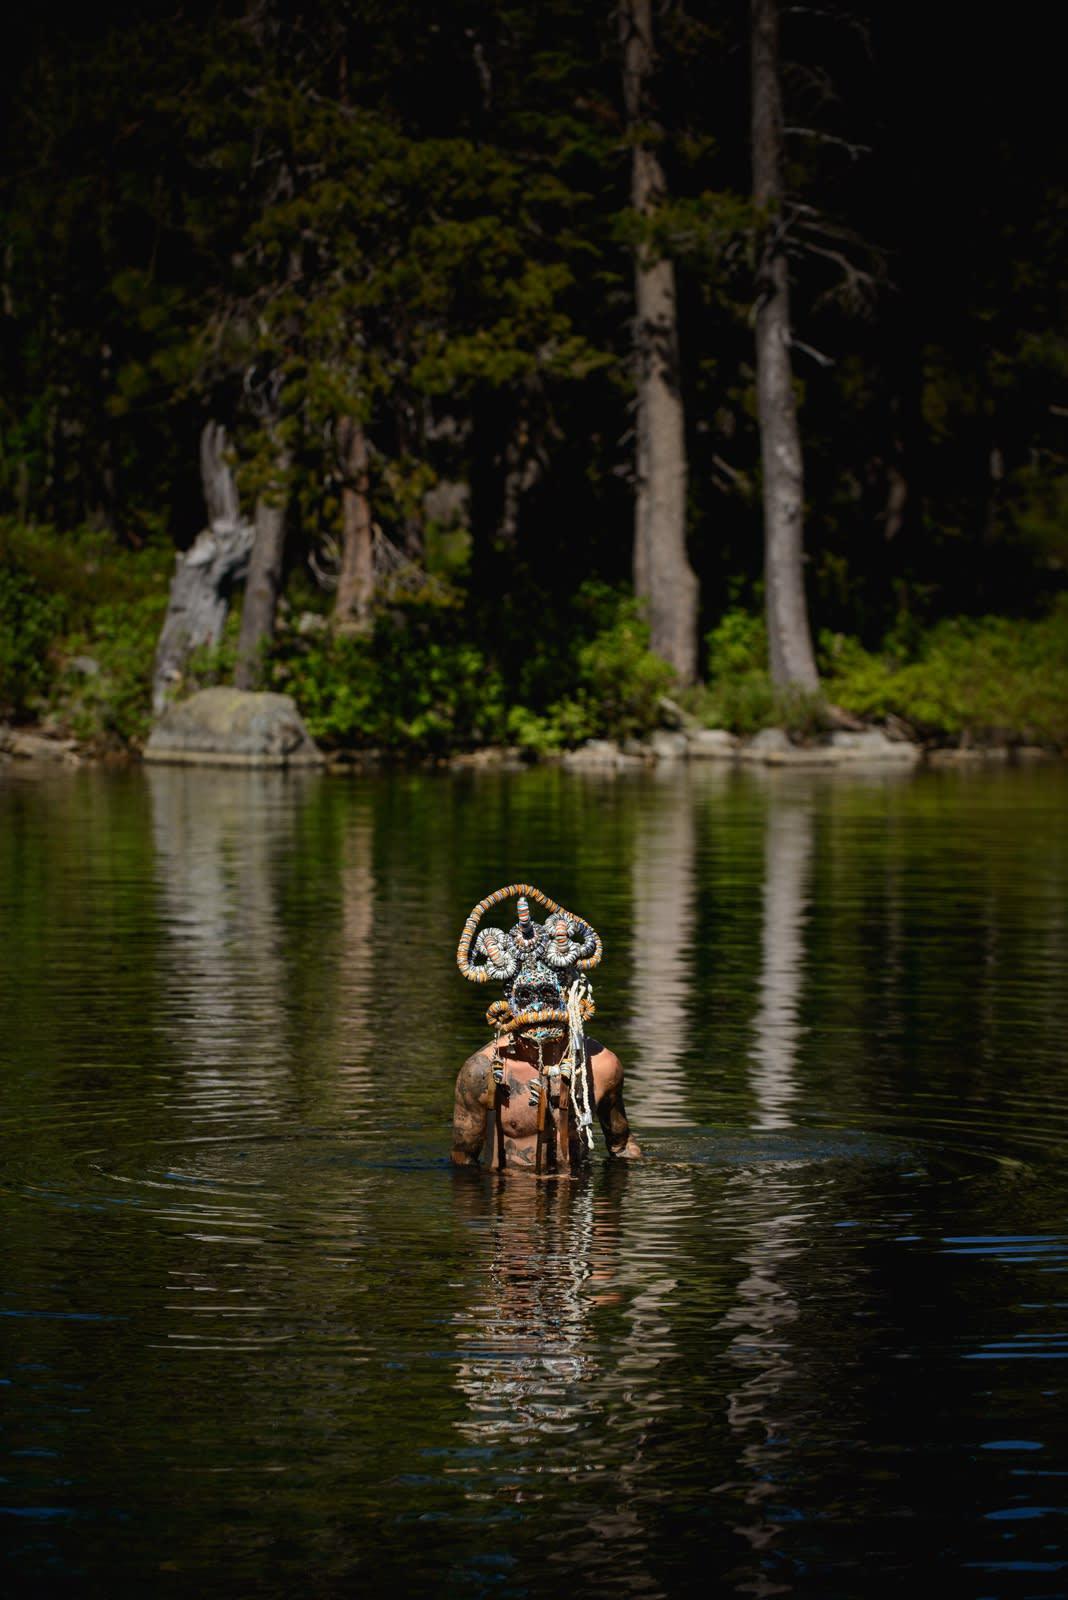 Portrait of artist Lucien Shapiro, nude in Mt. Shasta lake wearing ornate mask